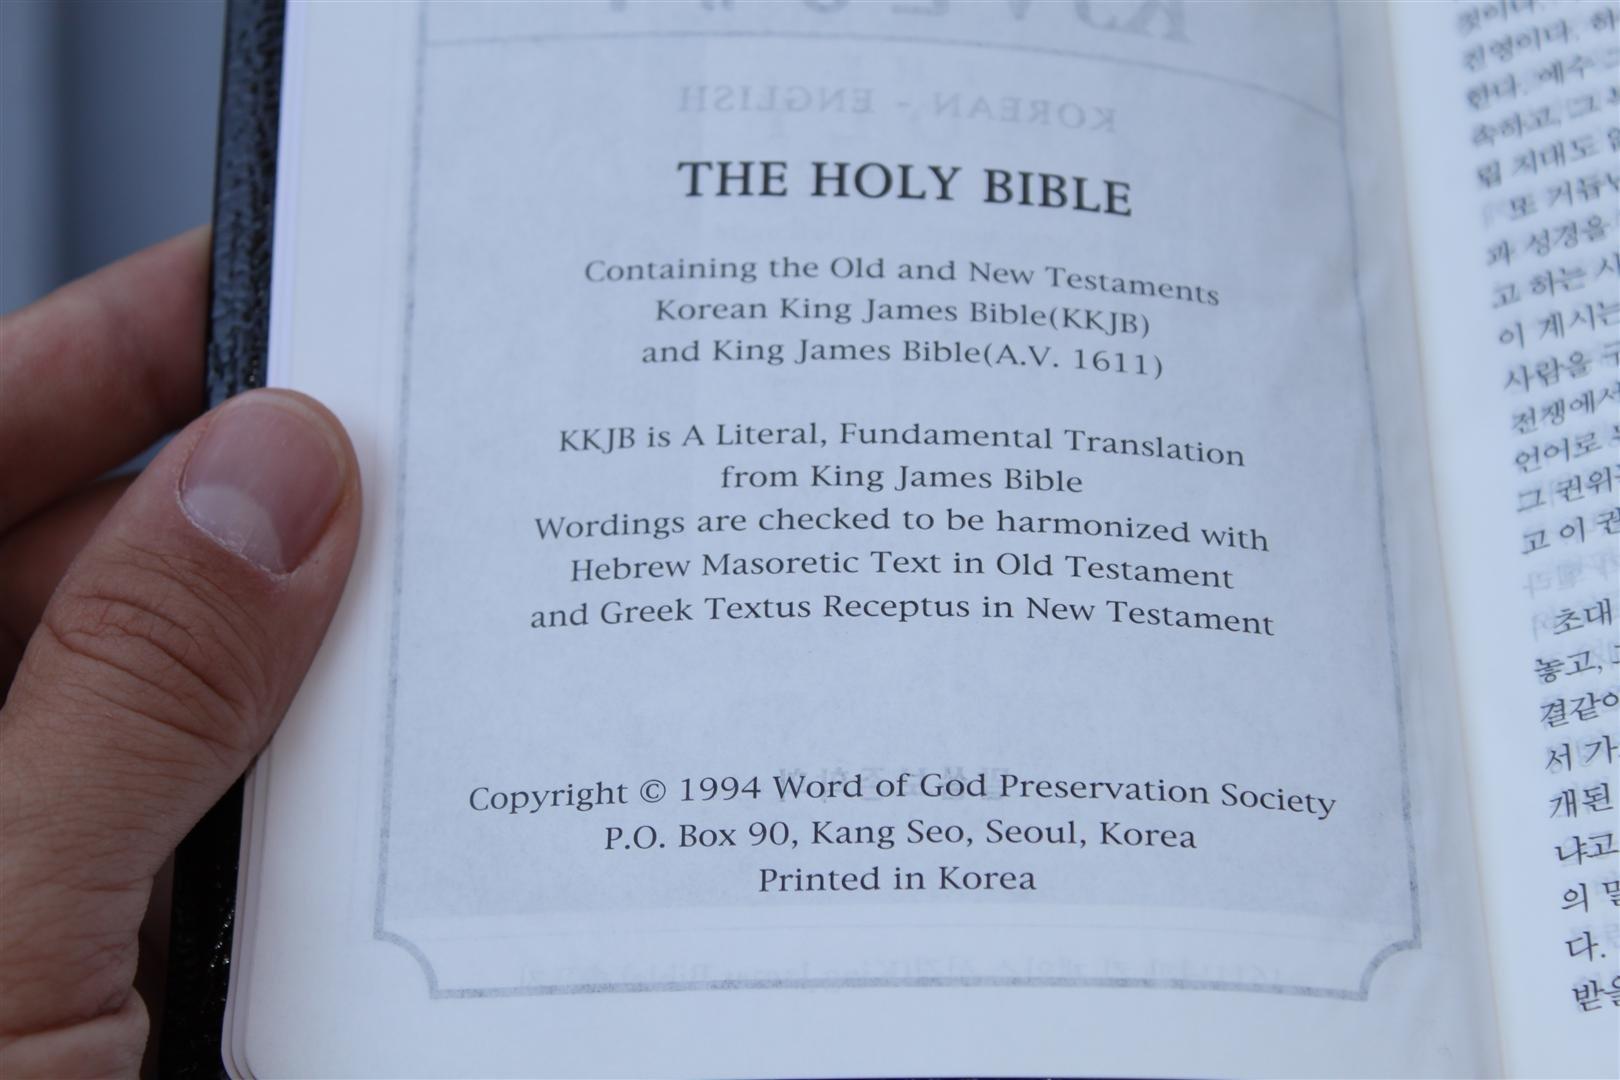 Korean - English HOly Bible KKJB - KJV / Korean King James